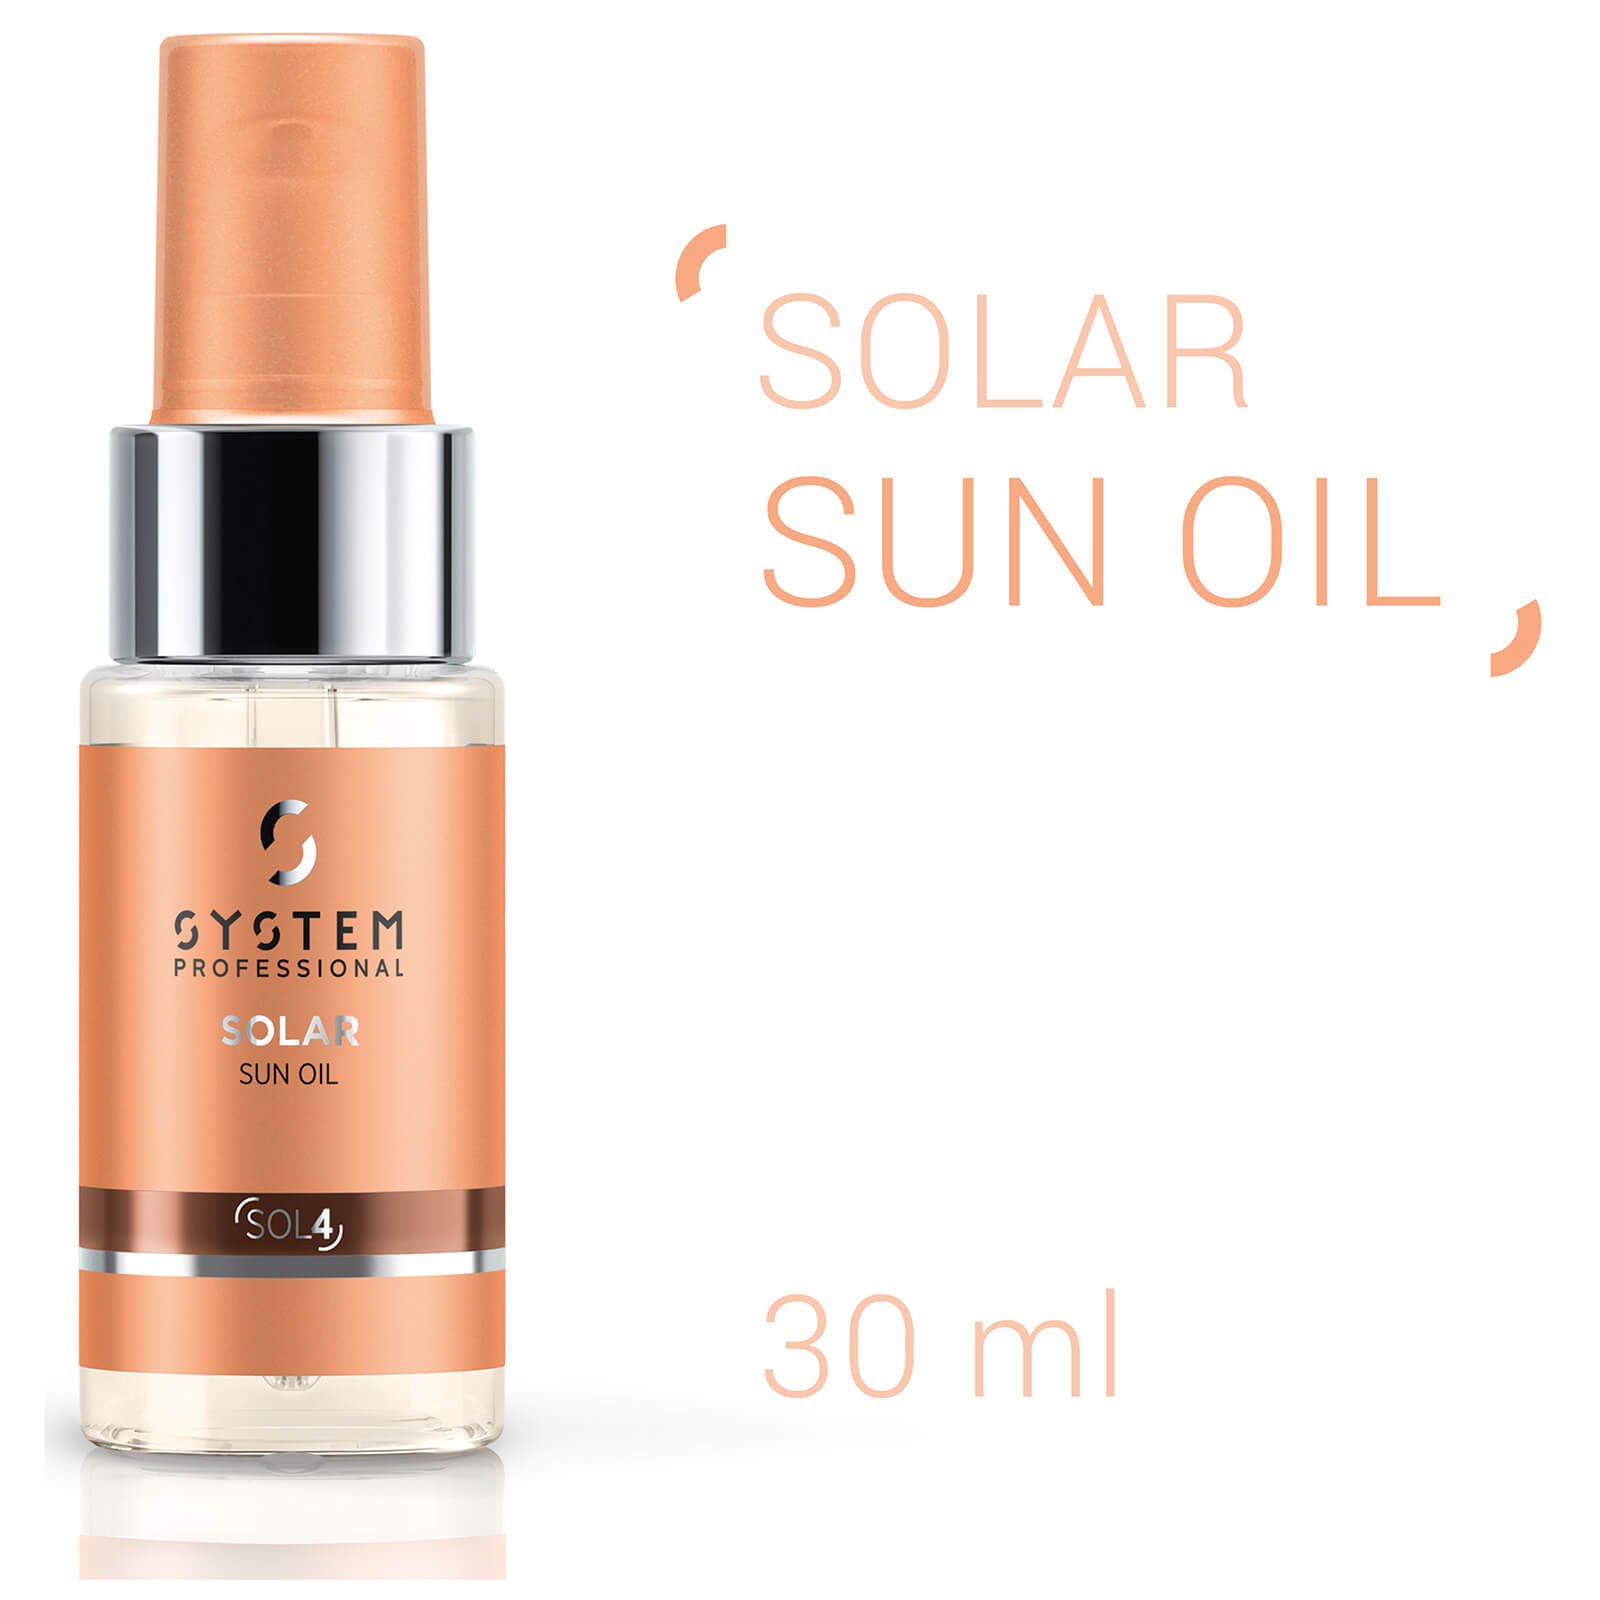 System Professional Solar Sun Oil 30ml